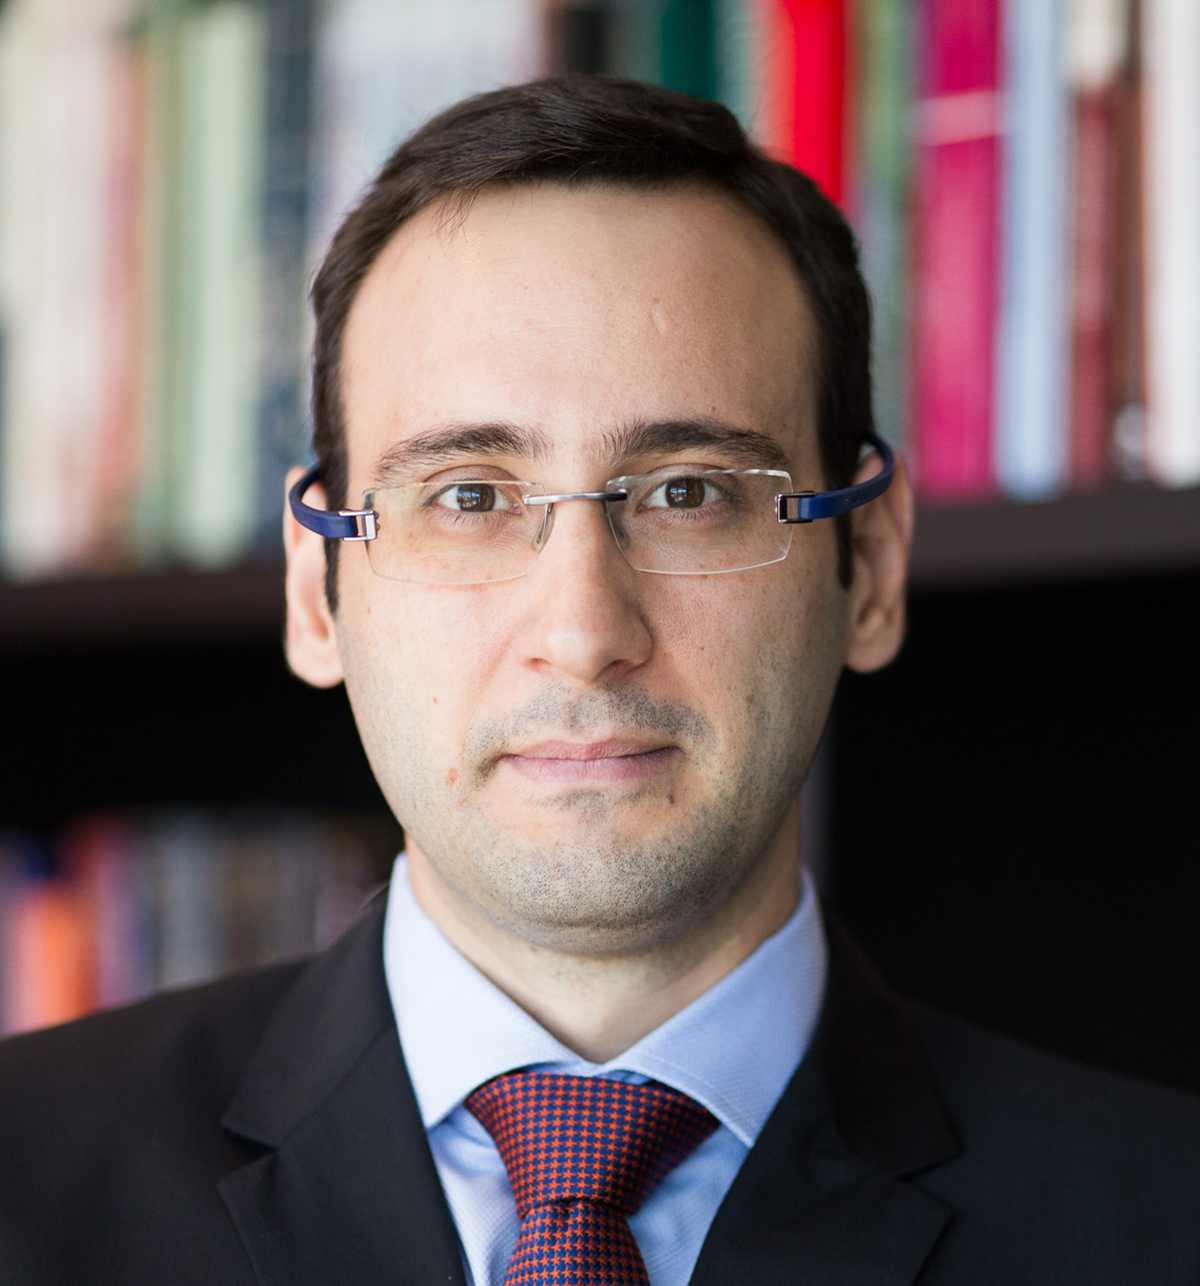 Guilherme Bier Barcelos